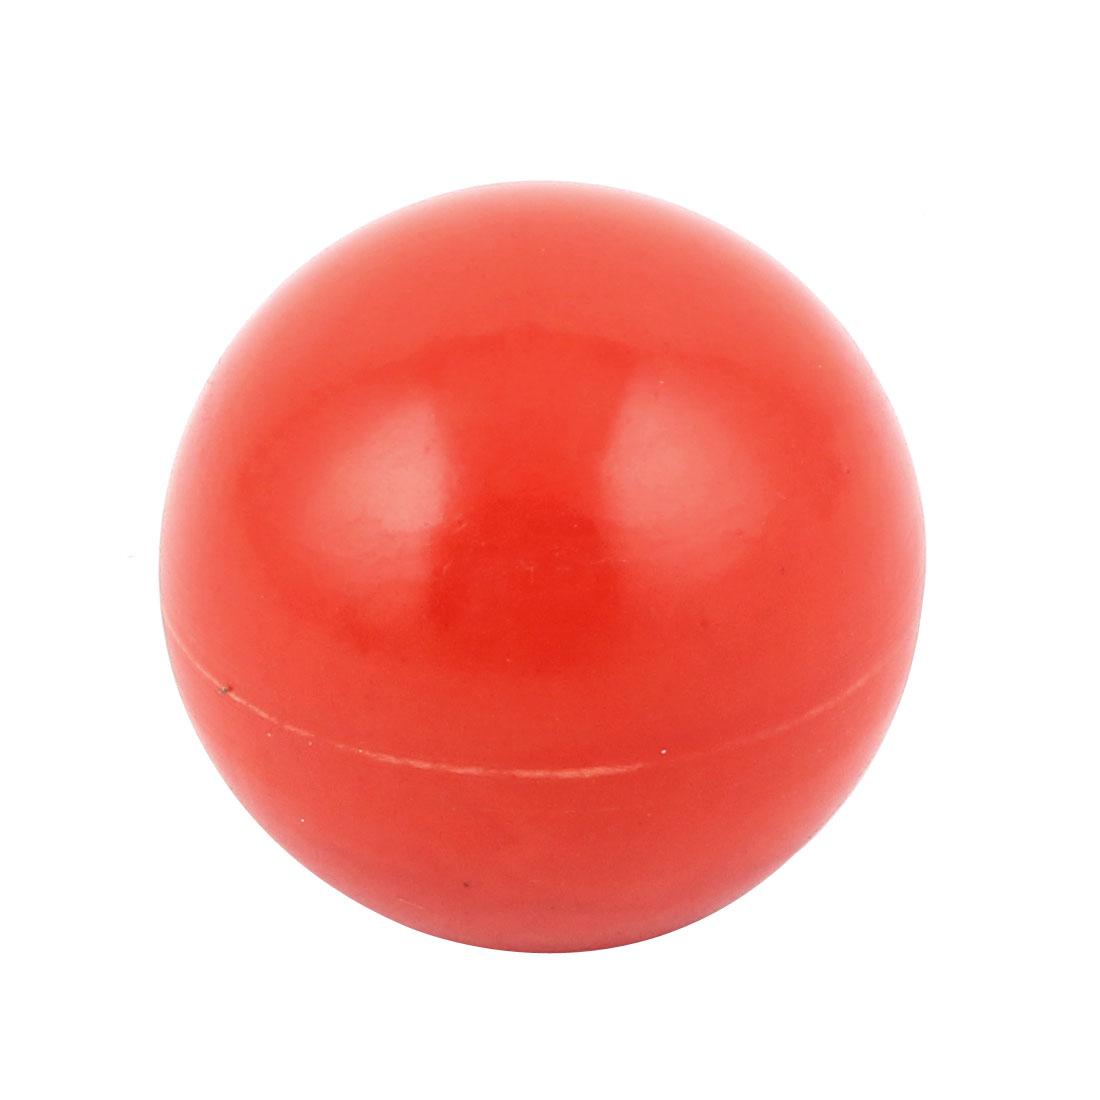 Cabinet Cupborad Dresser Drawer Door Plastic Ball Shape Knob Pull Handle Red